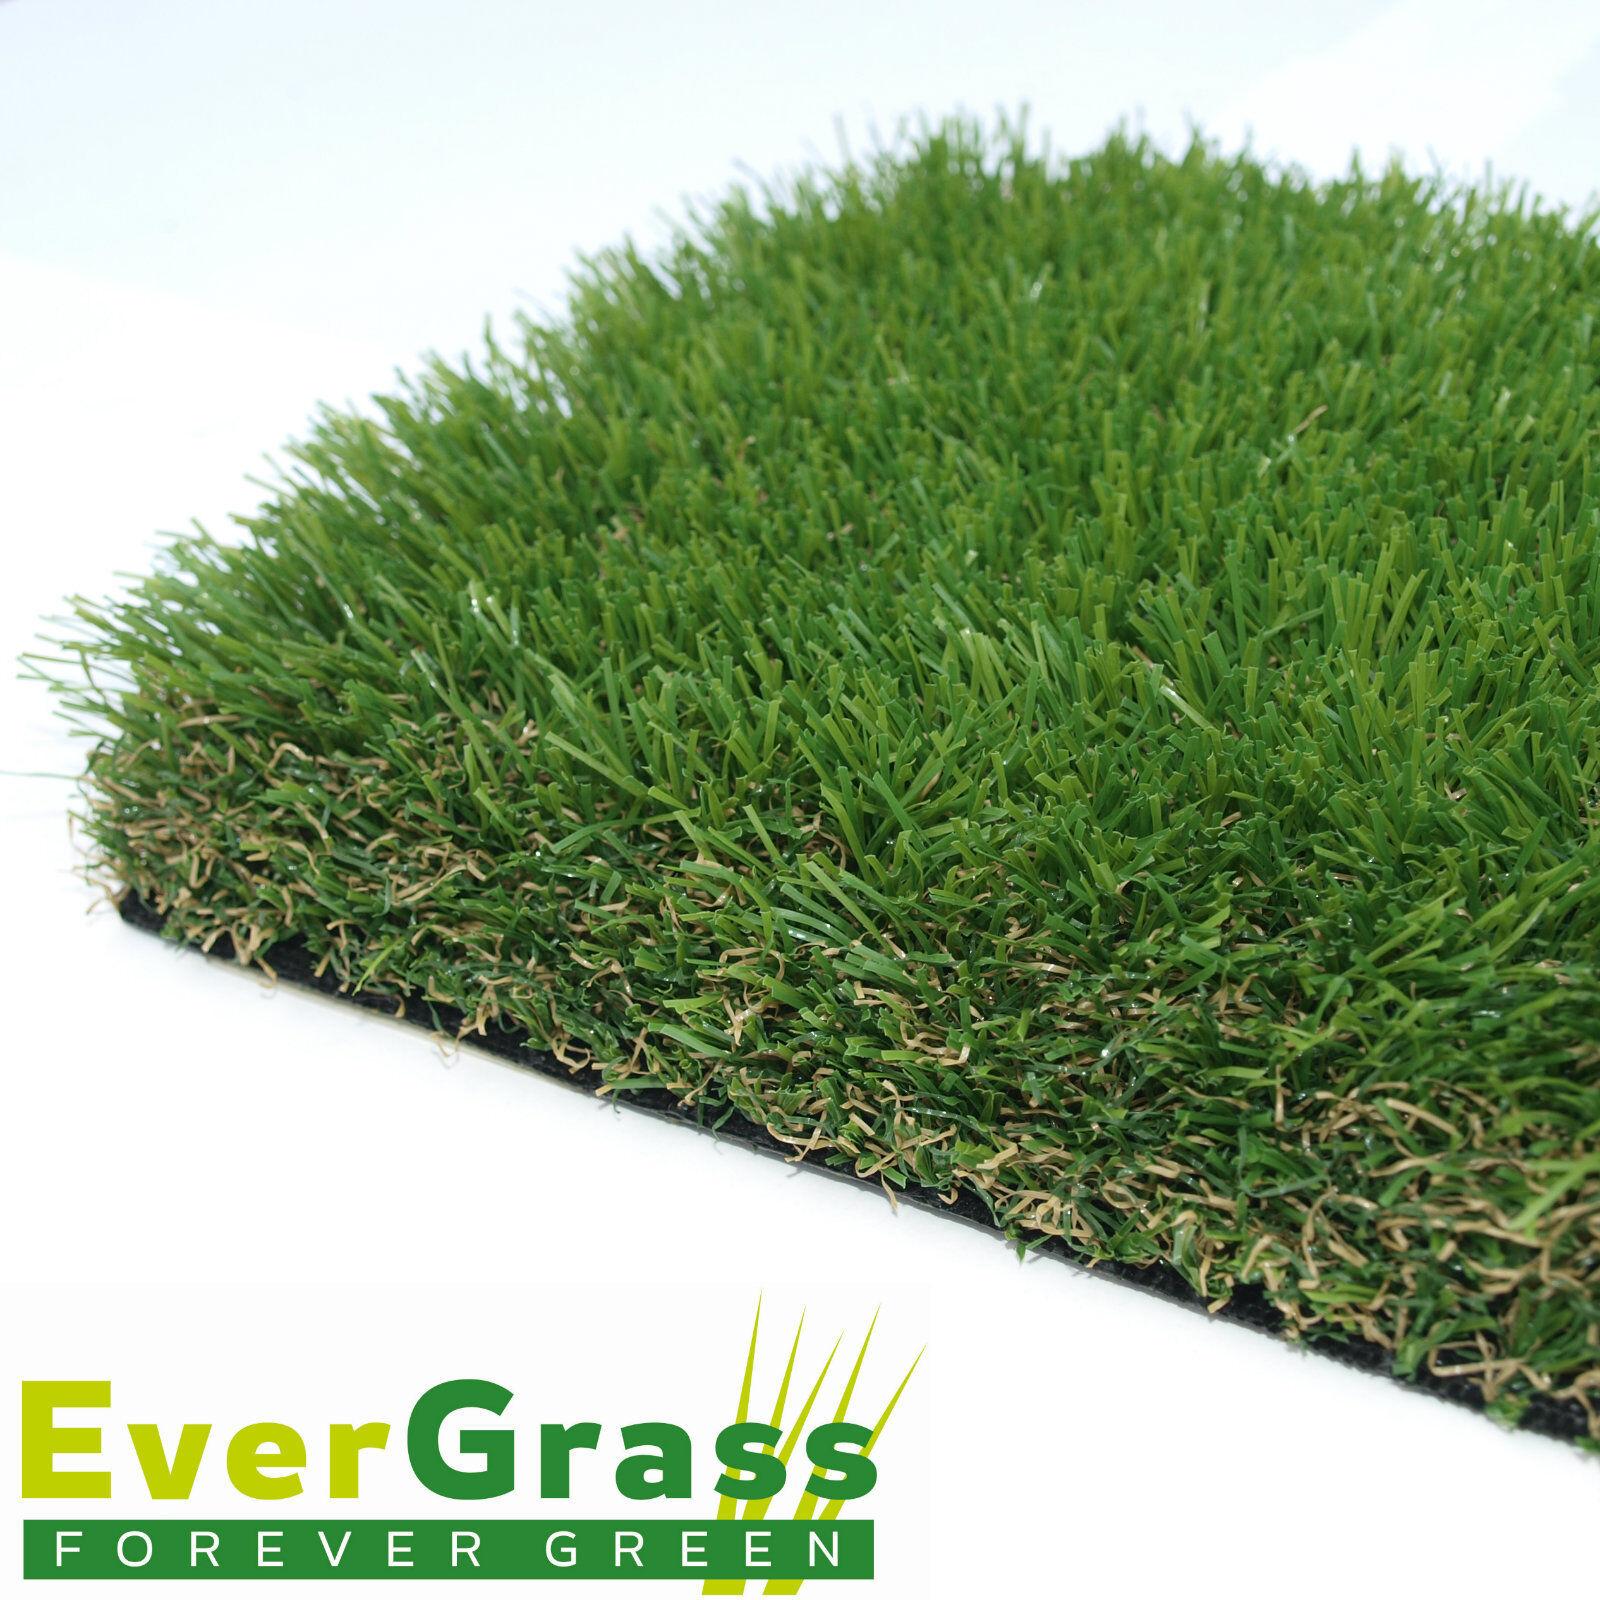 St Lucia 40mm Artificial Grass 4m x 4m Garden Turf Lawn Astro Green Fake Plastic